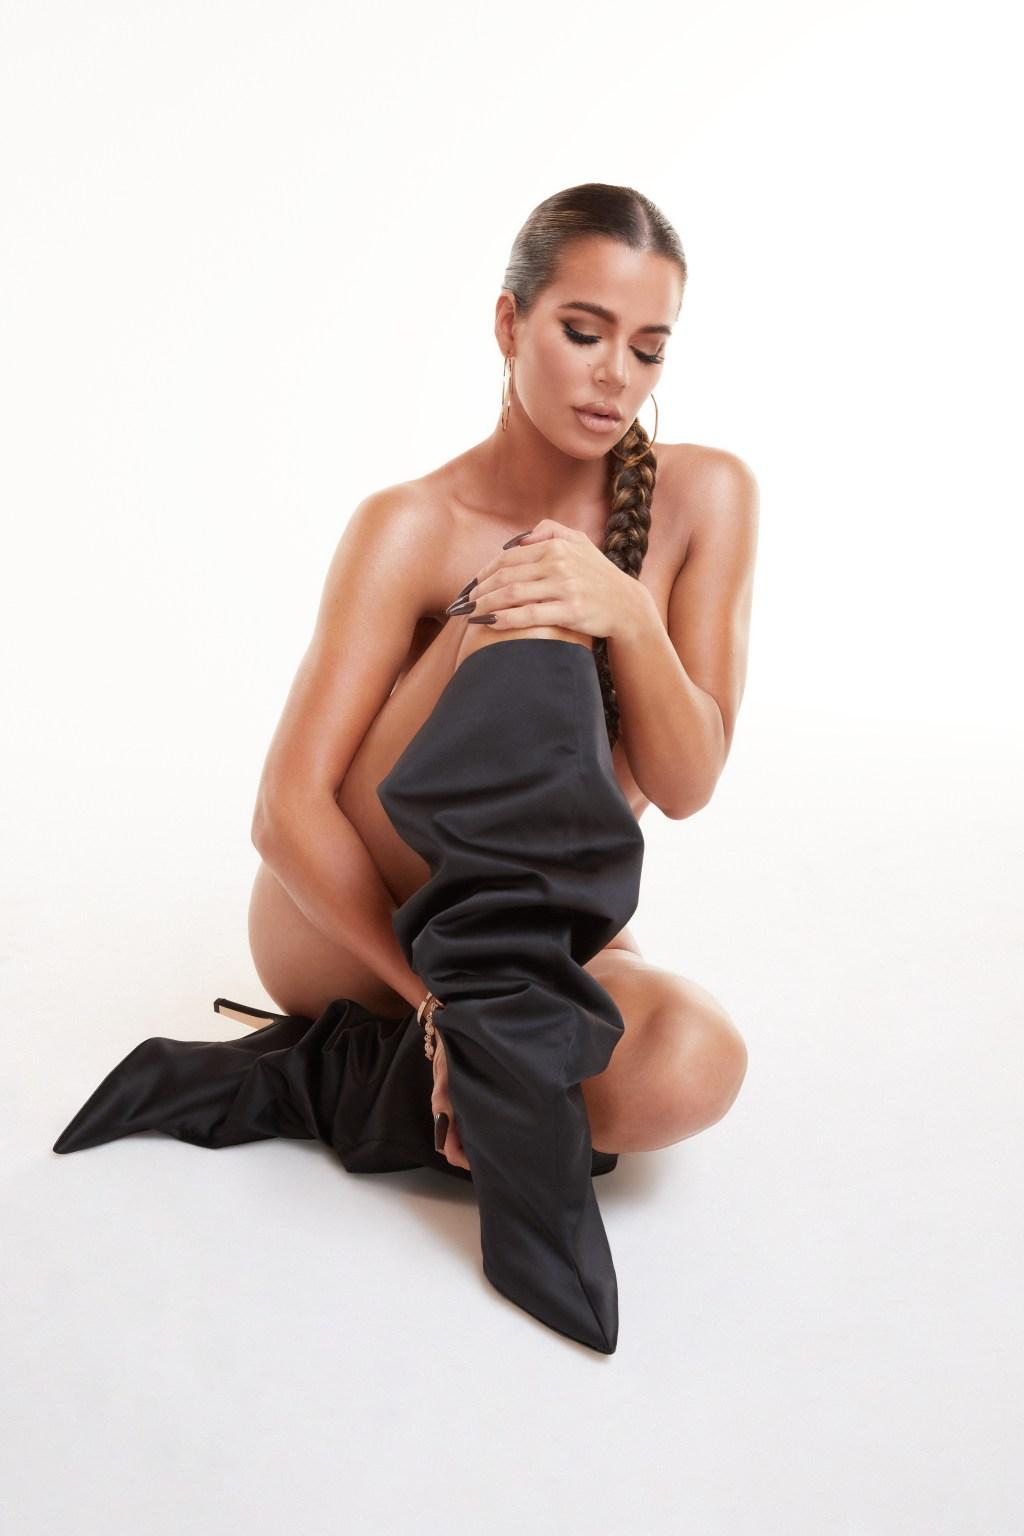 Khloé Kardashian in Good American's OOO boots.